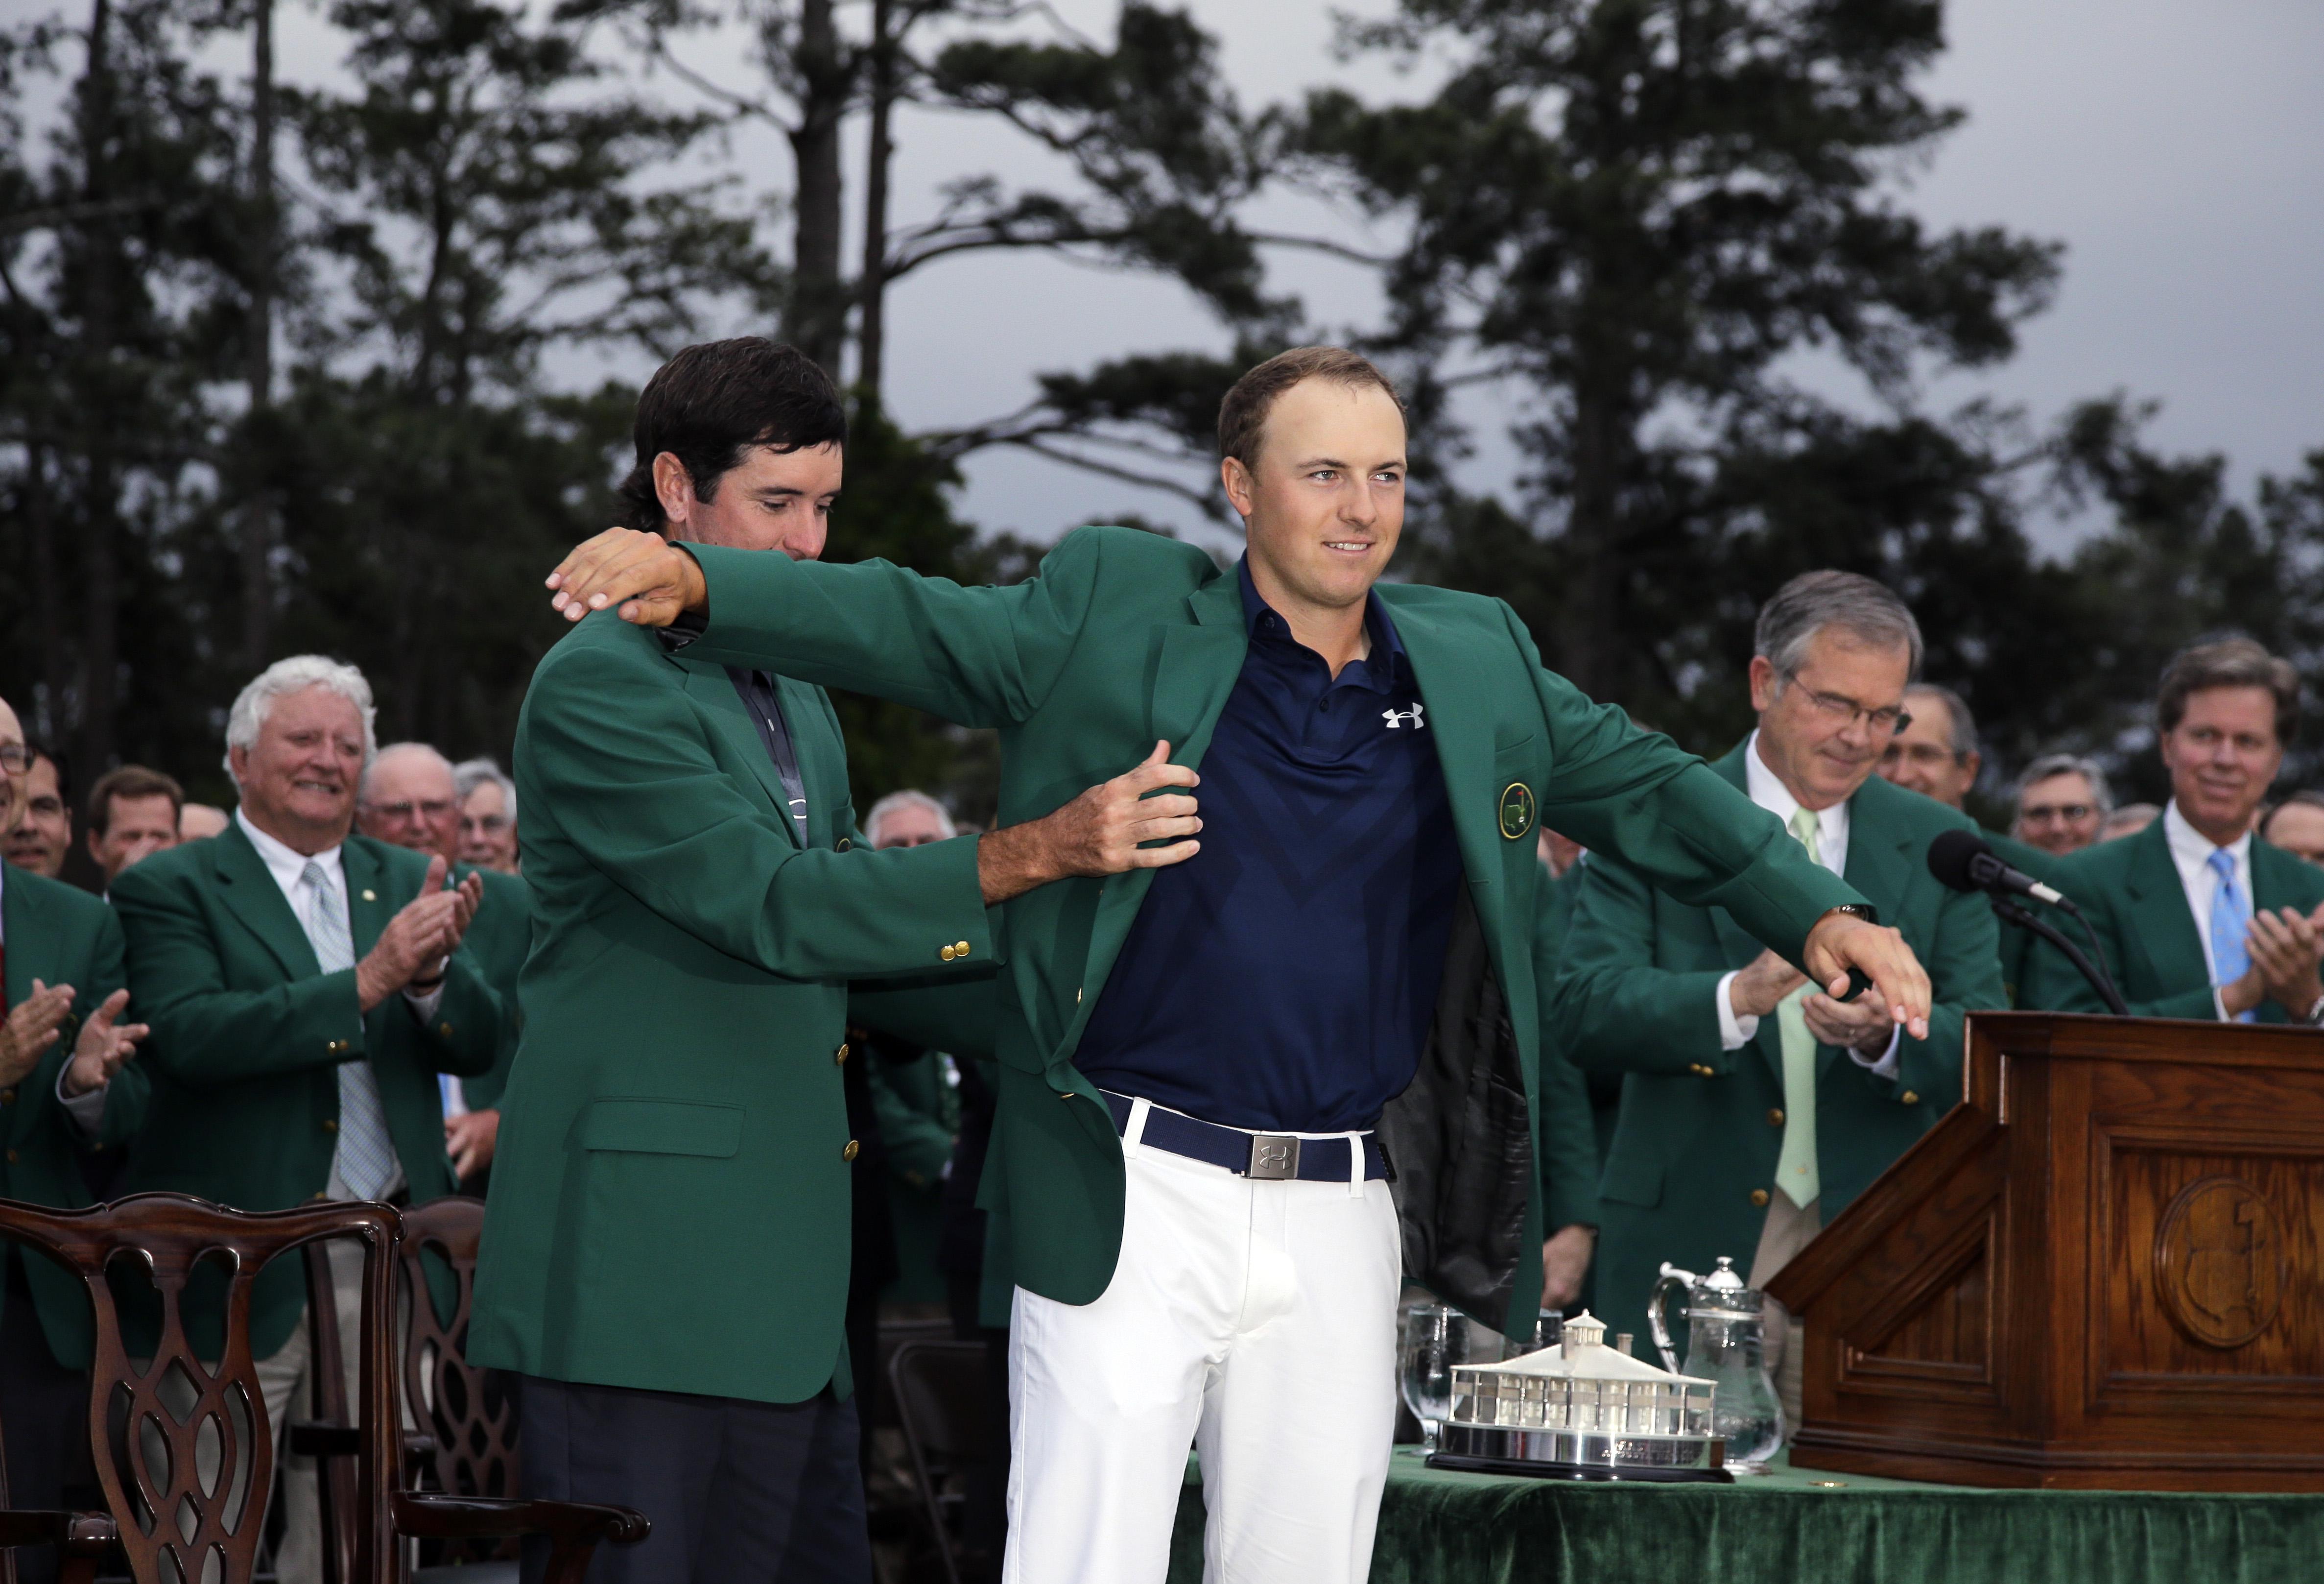 Bubba Watson helps Jordan Spieth put on his green jacket after winning the Masters golf tournament. (AP Photo/Matt Slocum)